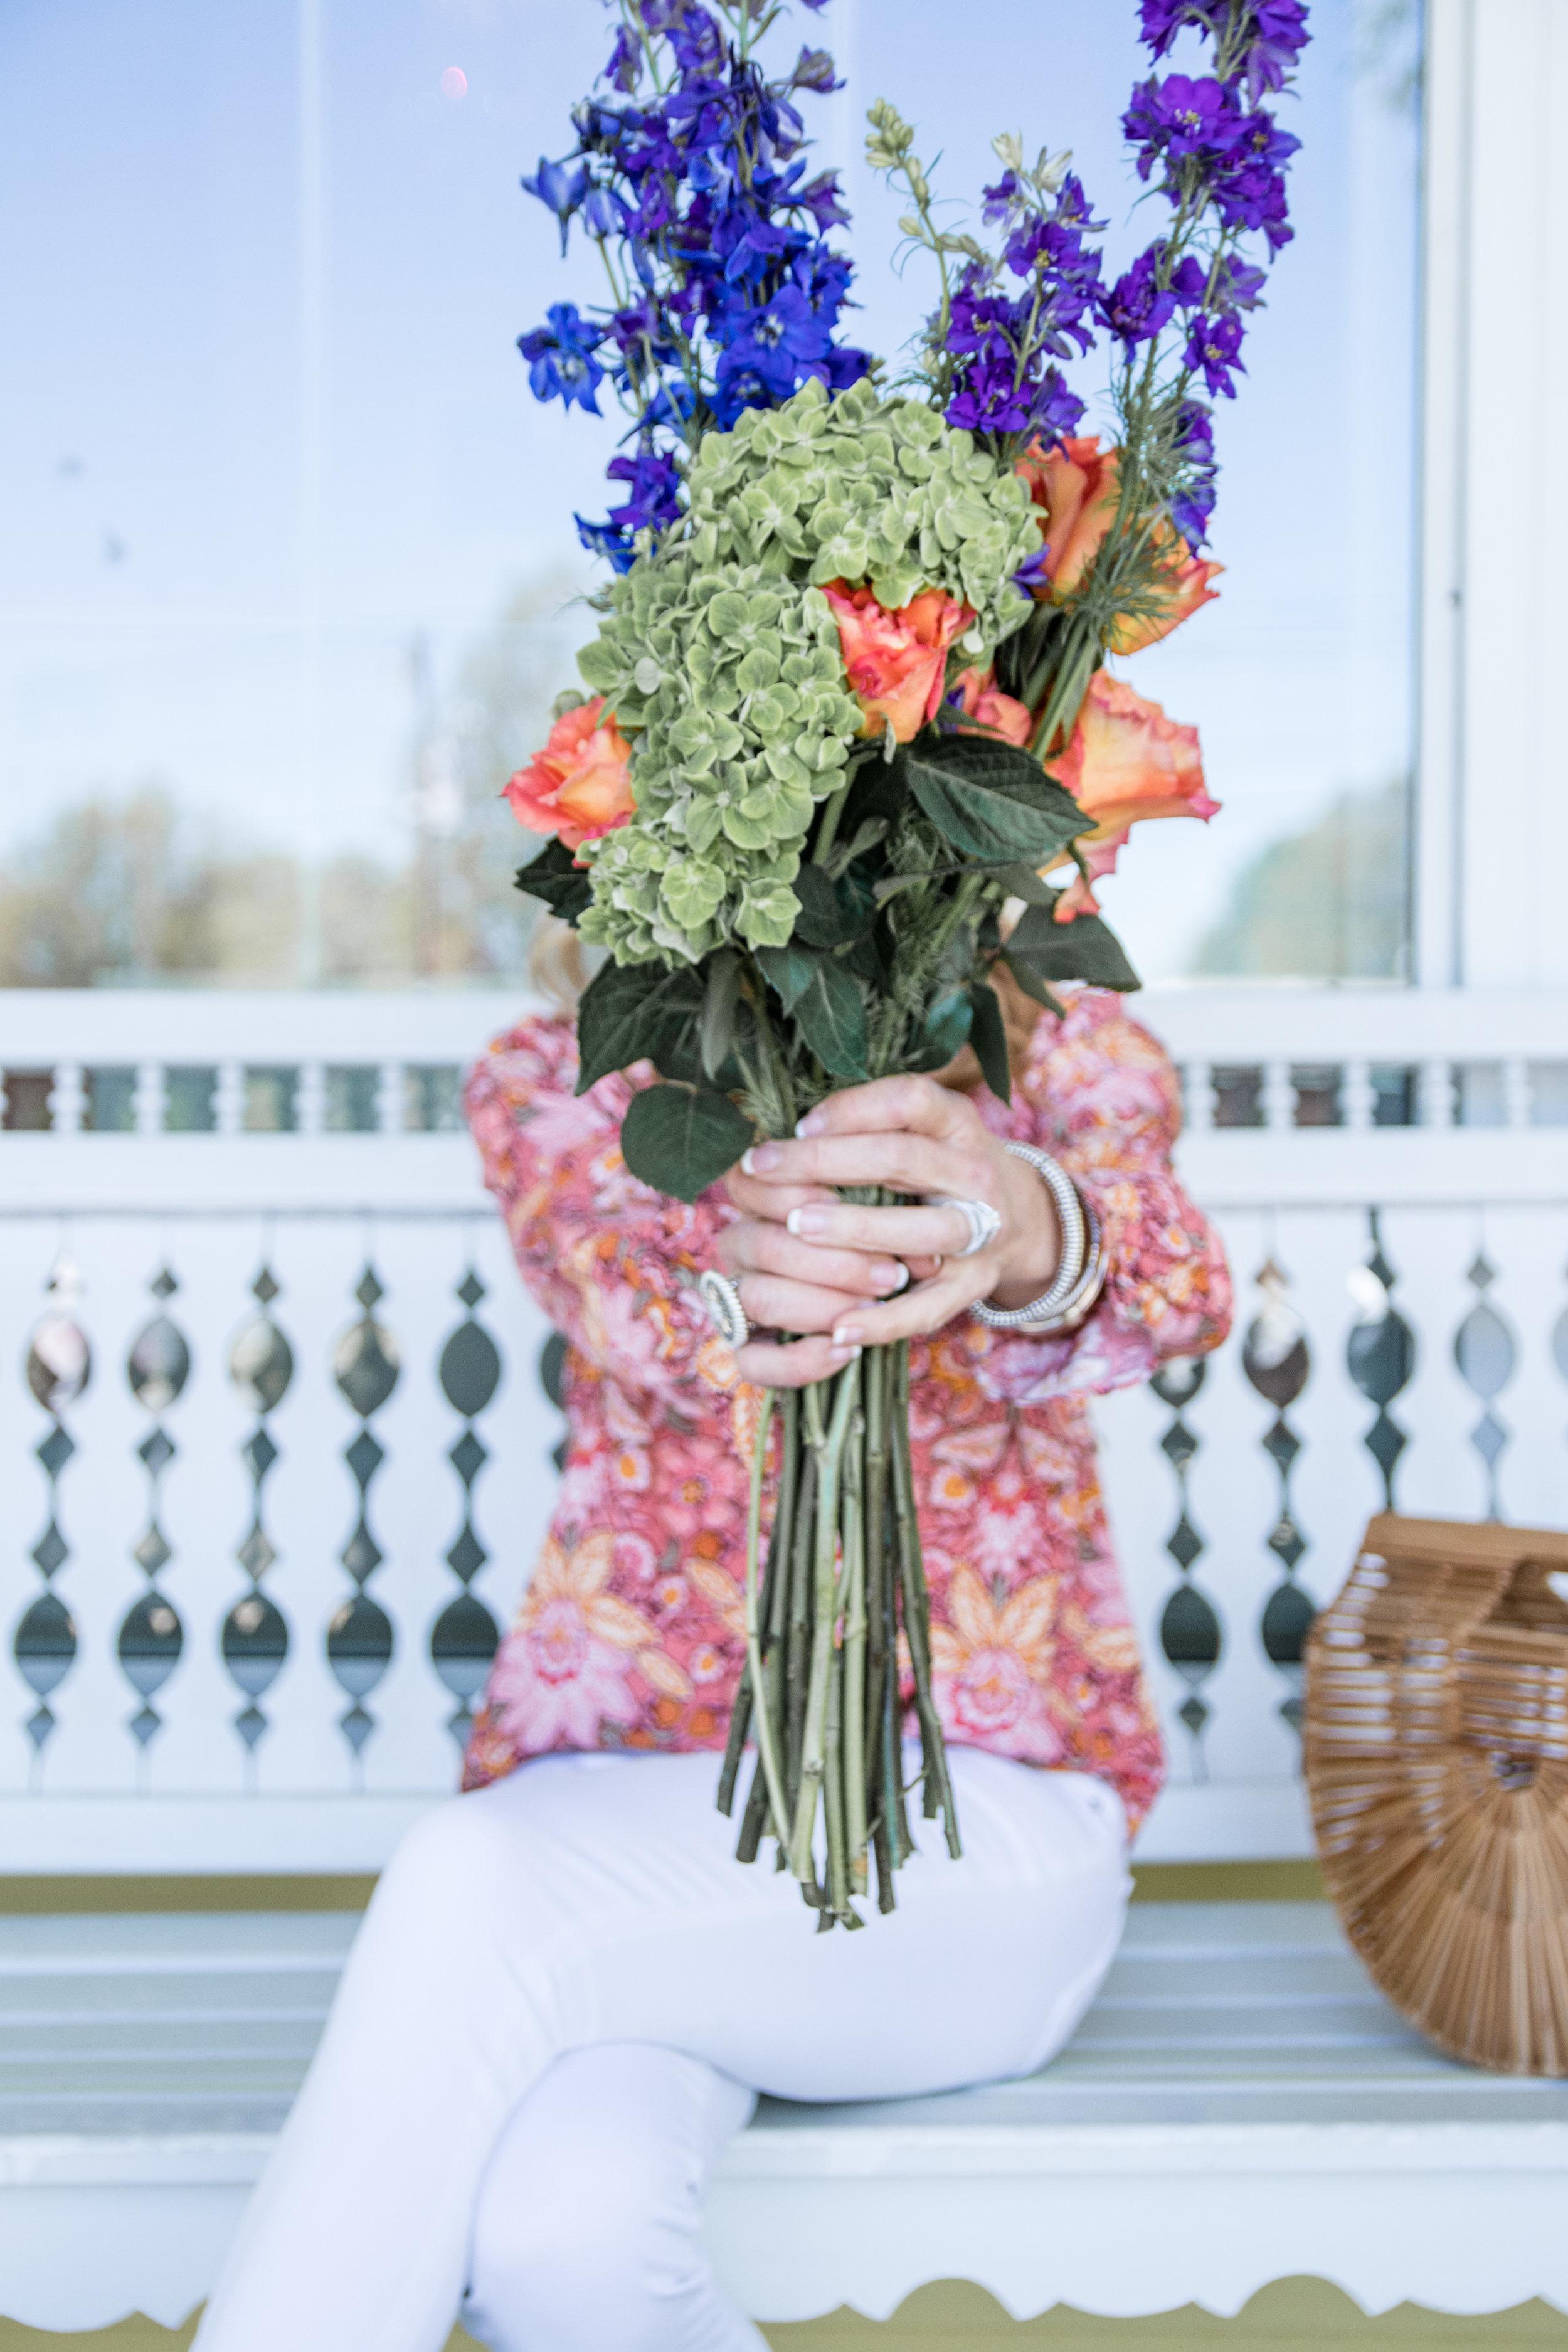 Randy McManus Flowers - Crazy Blonde Life